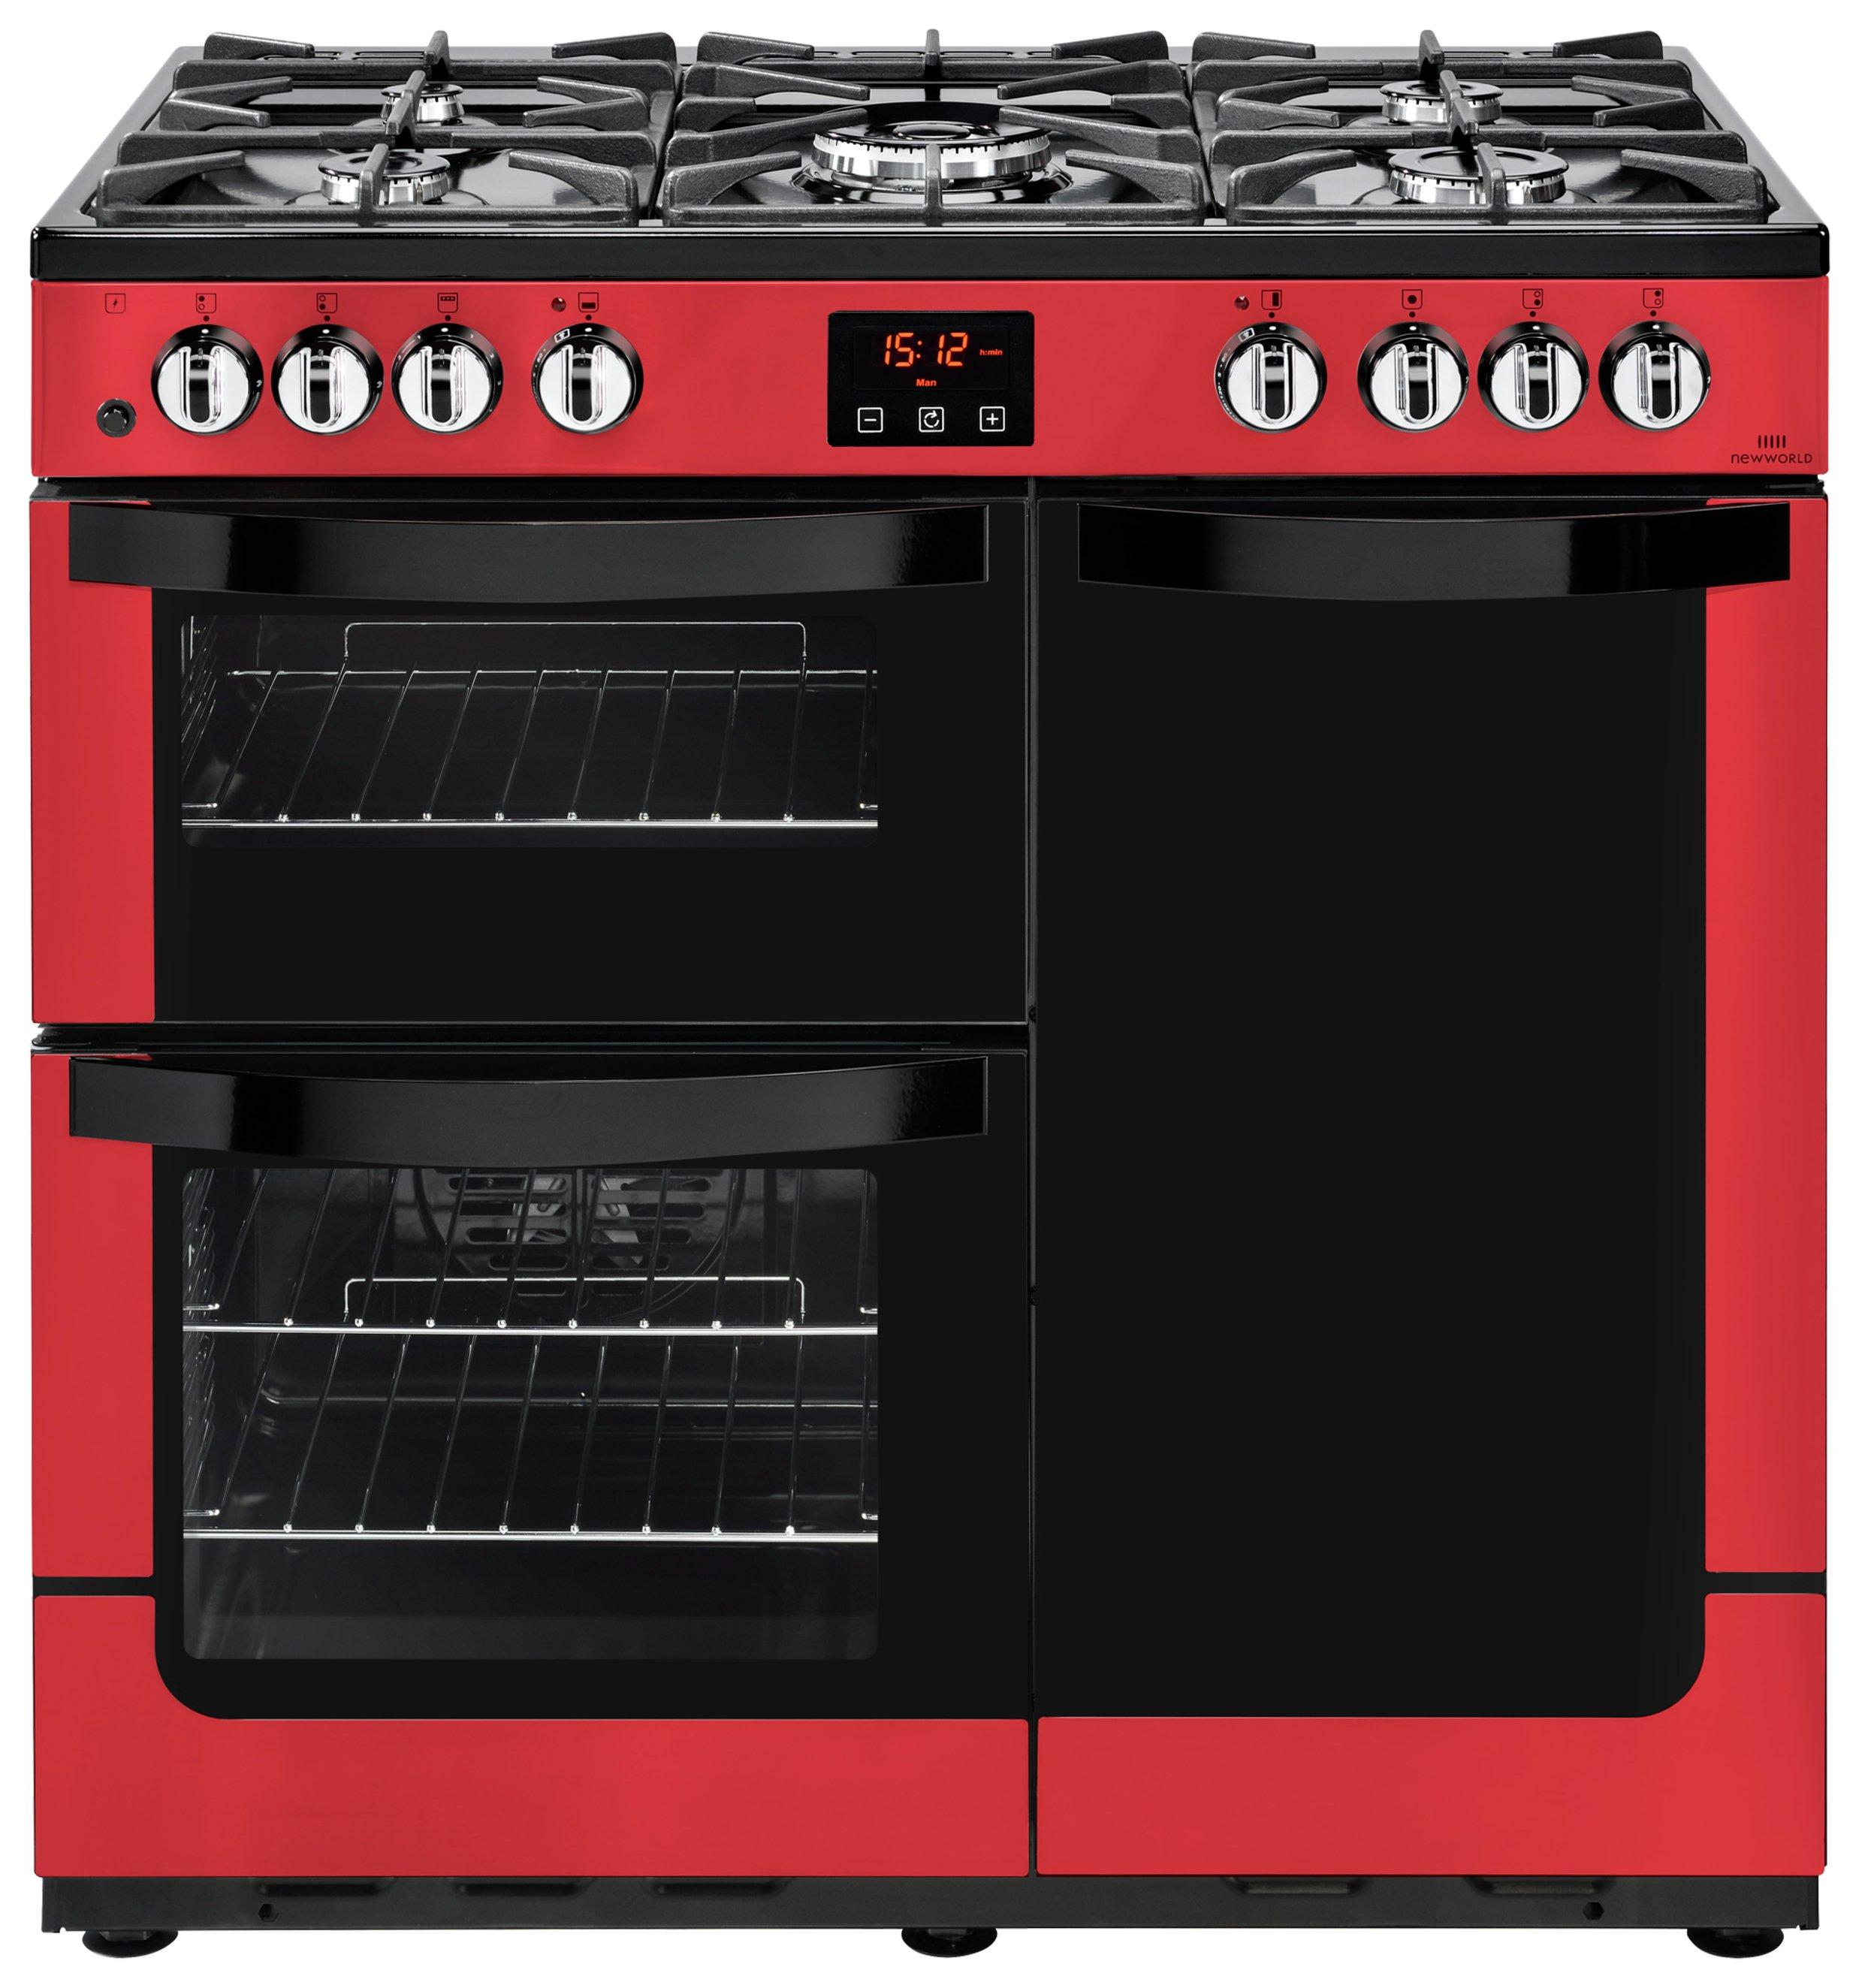 New World Vision 90DFT Duel Fuel Range Cooker - Red + Installation